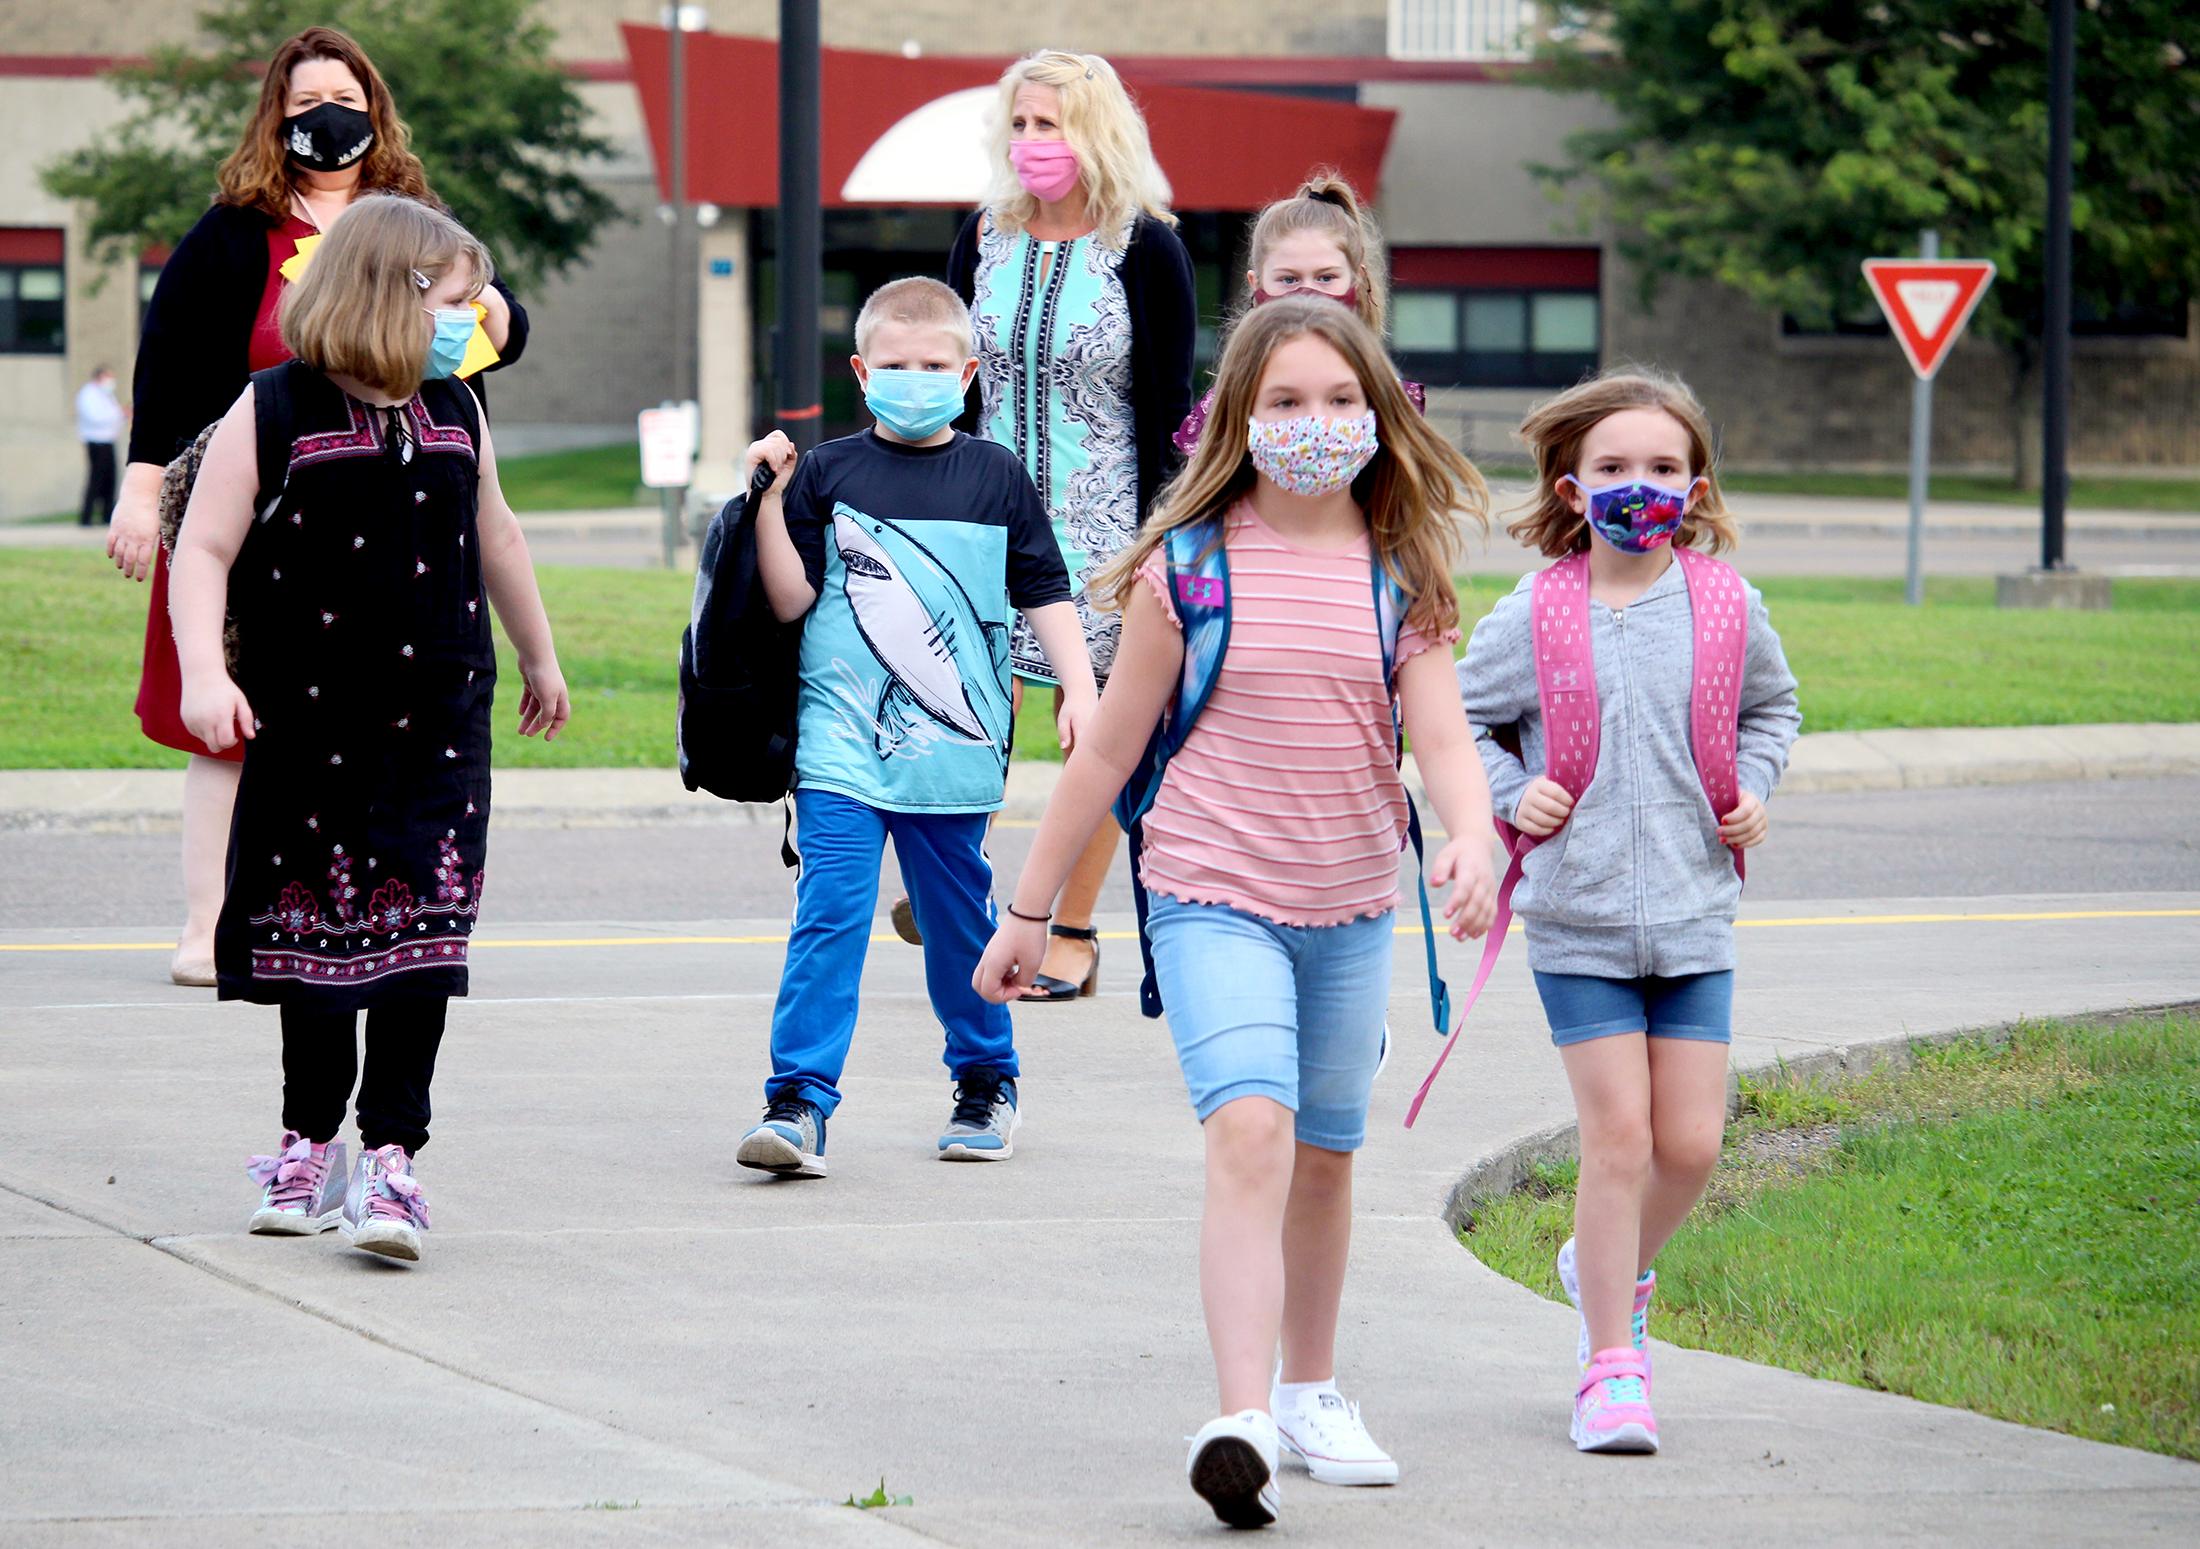 Students arrive at school (9/2020)